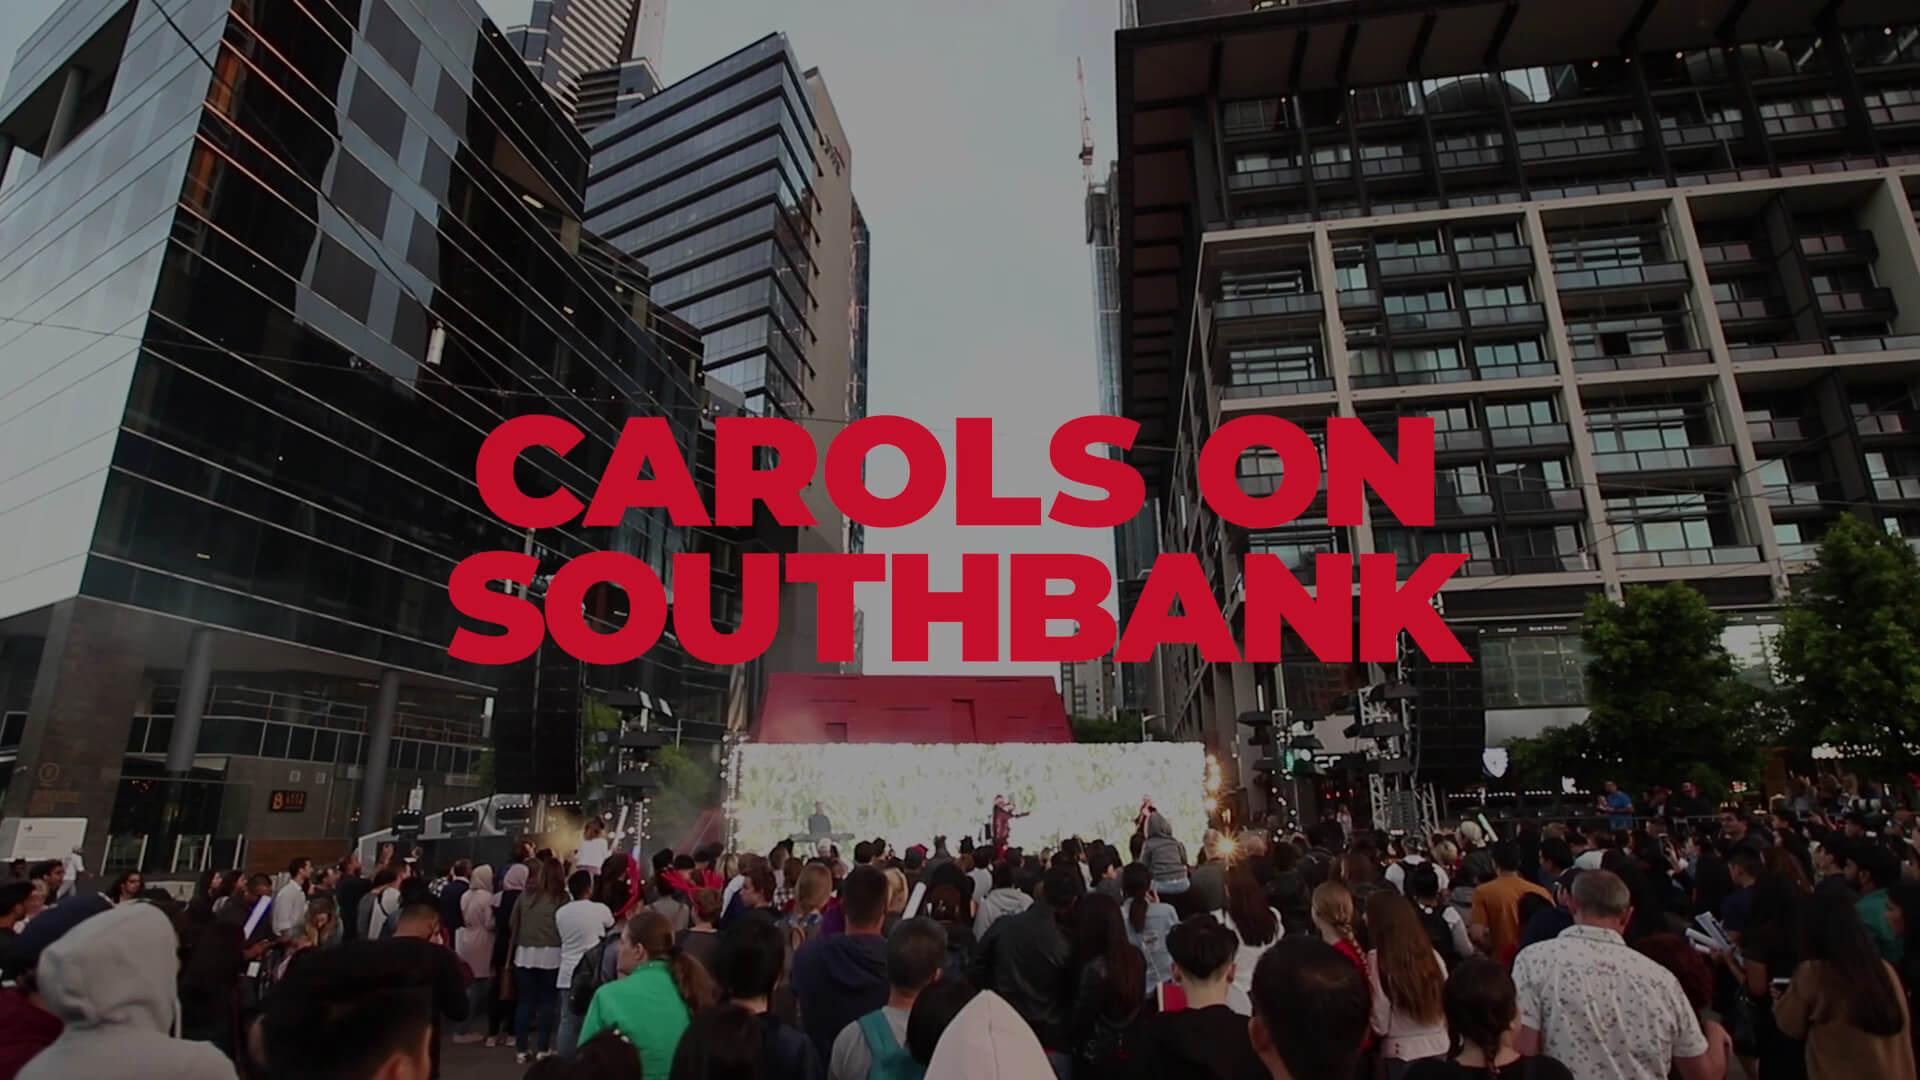 Carols on Southbank video Highlights